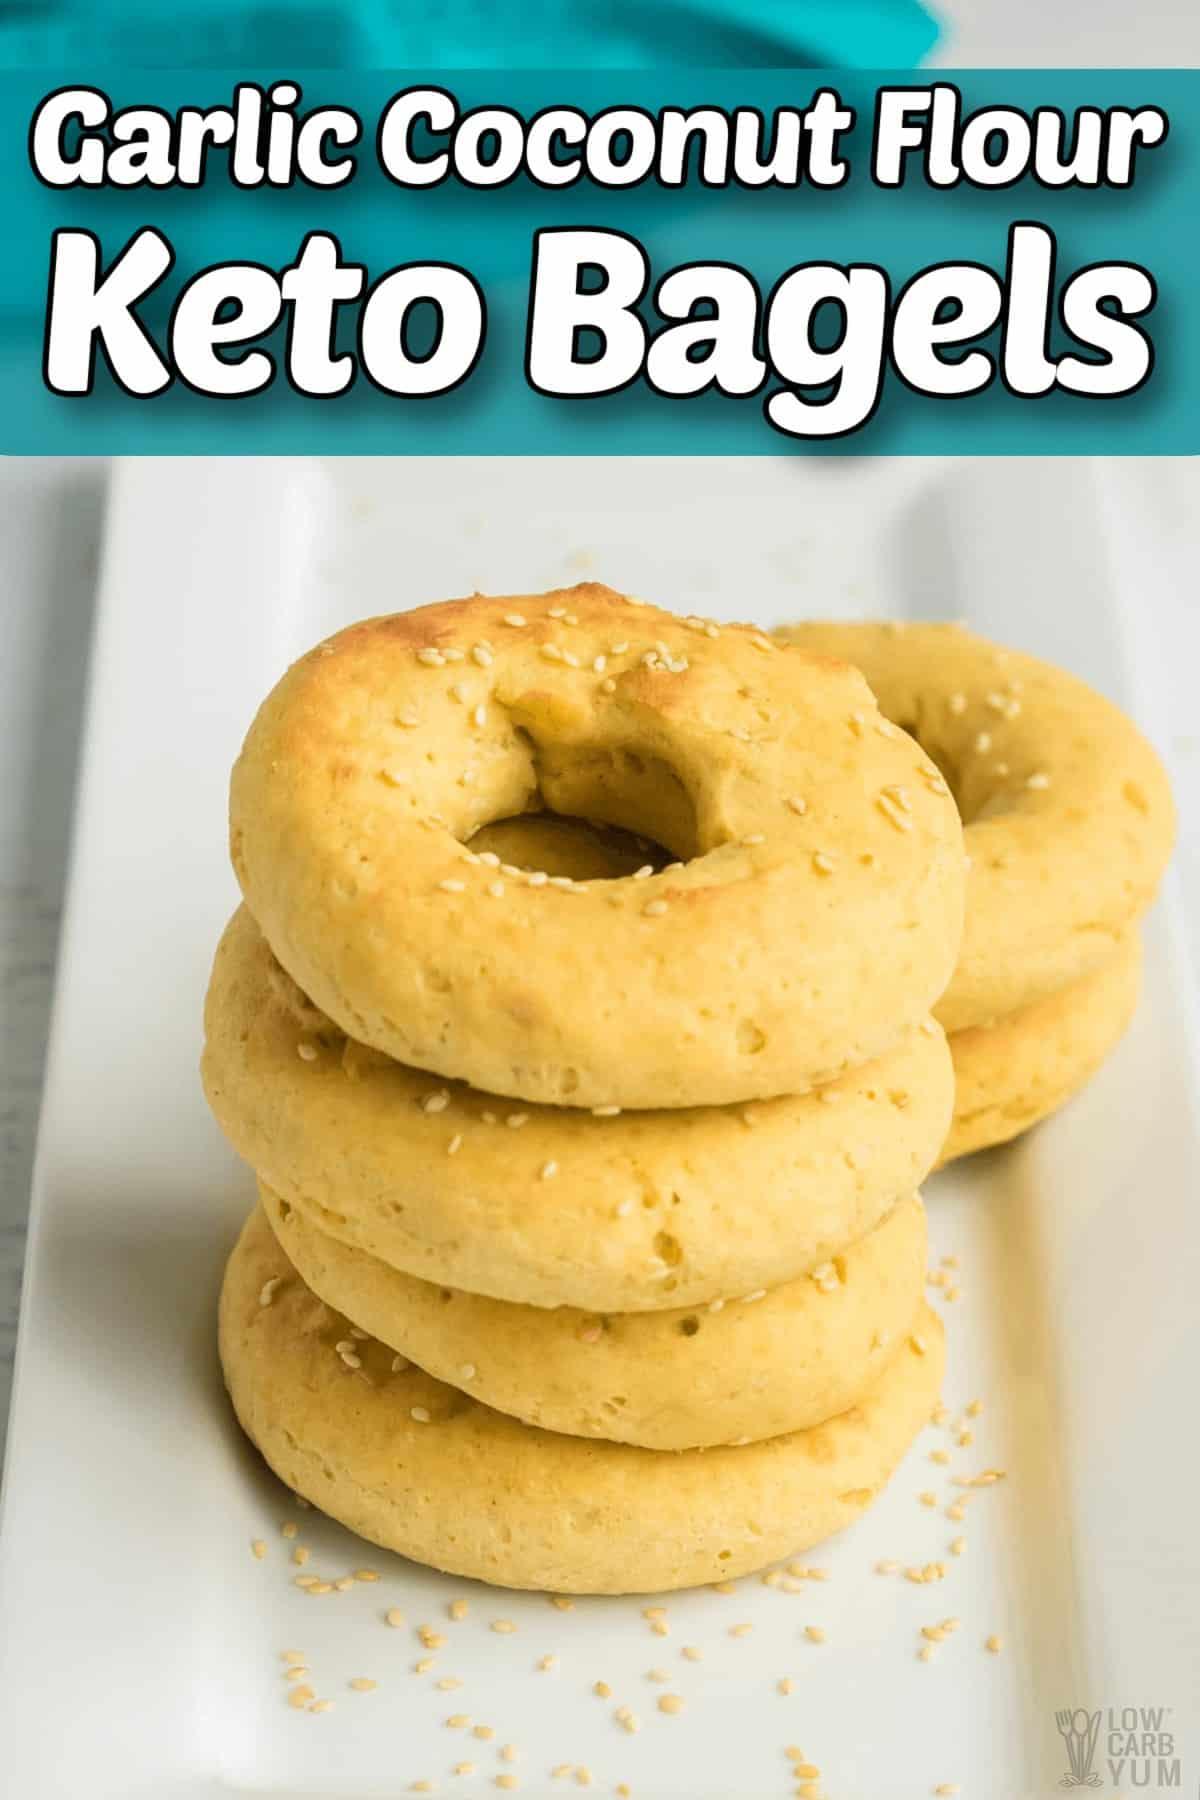 garlic coconut flour keto bagels pintrest image